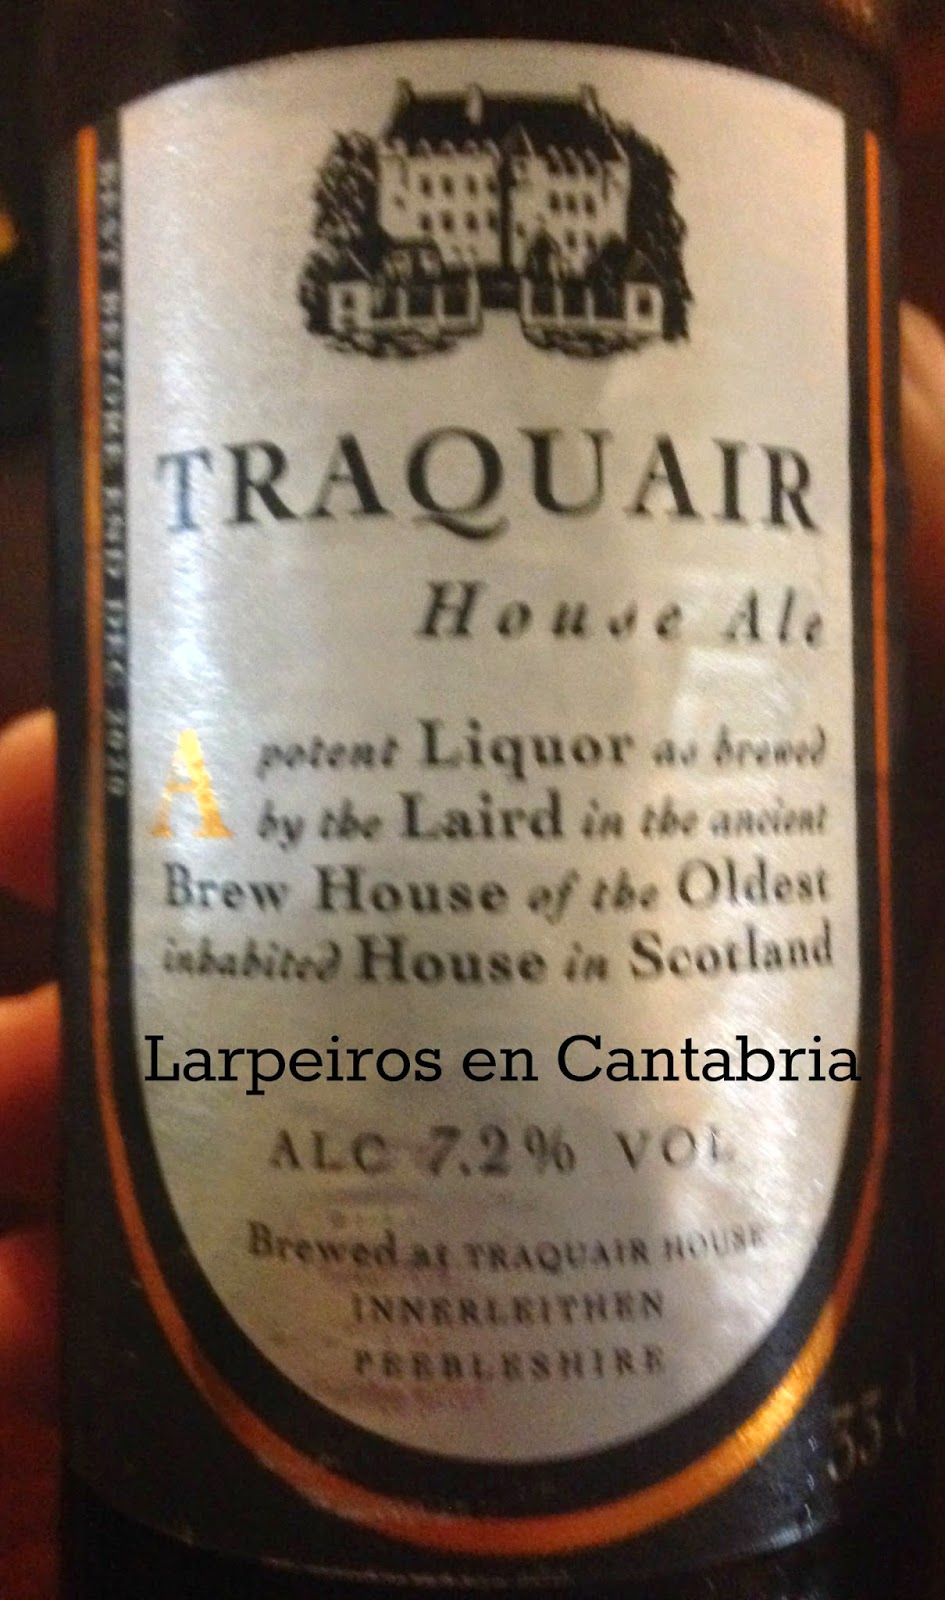 Cerveza Traquair House Ale: Interesante